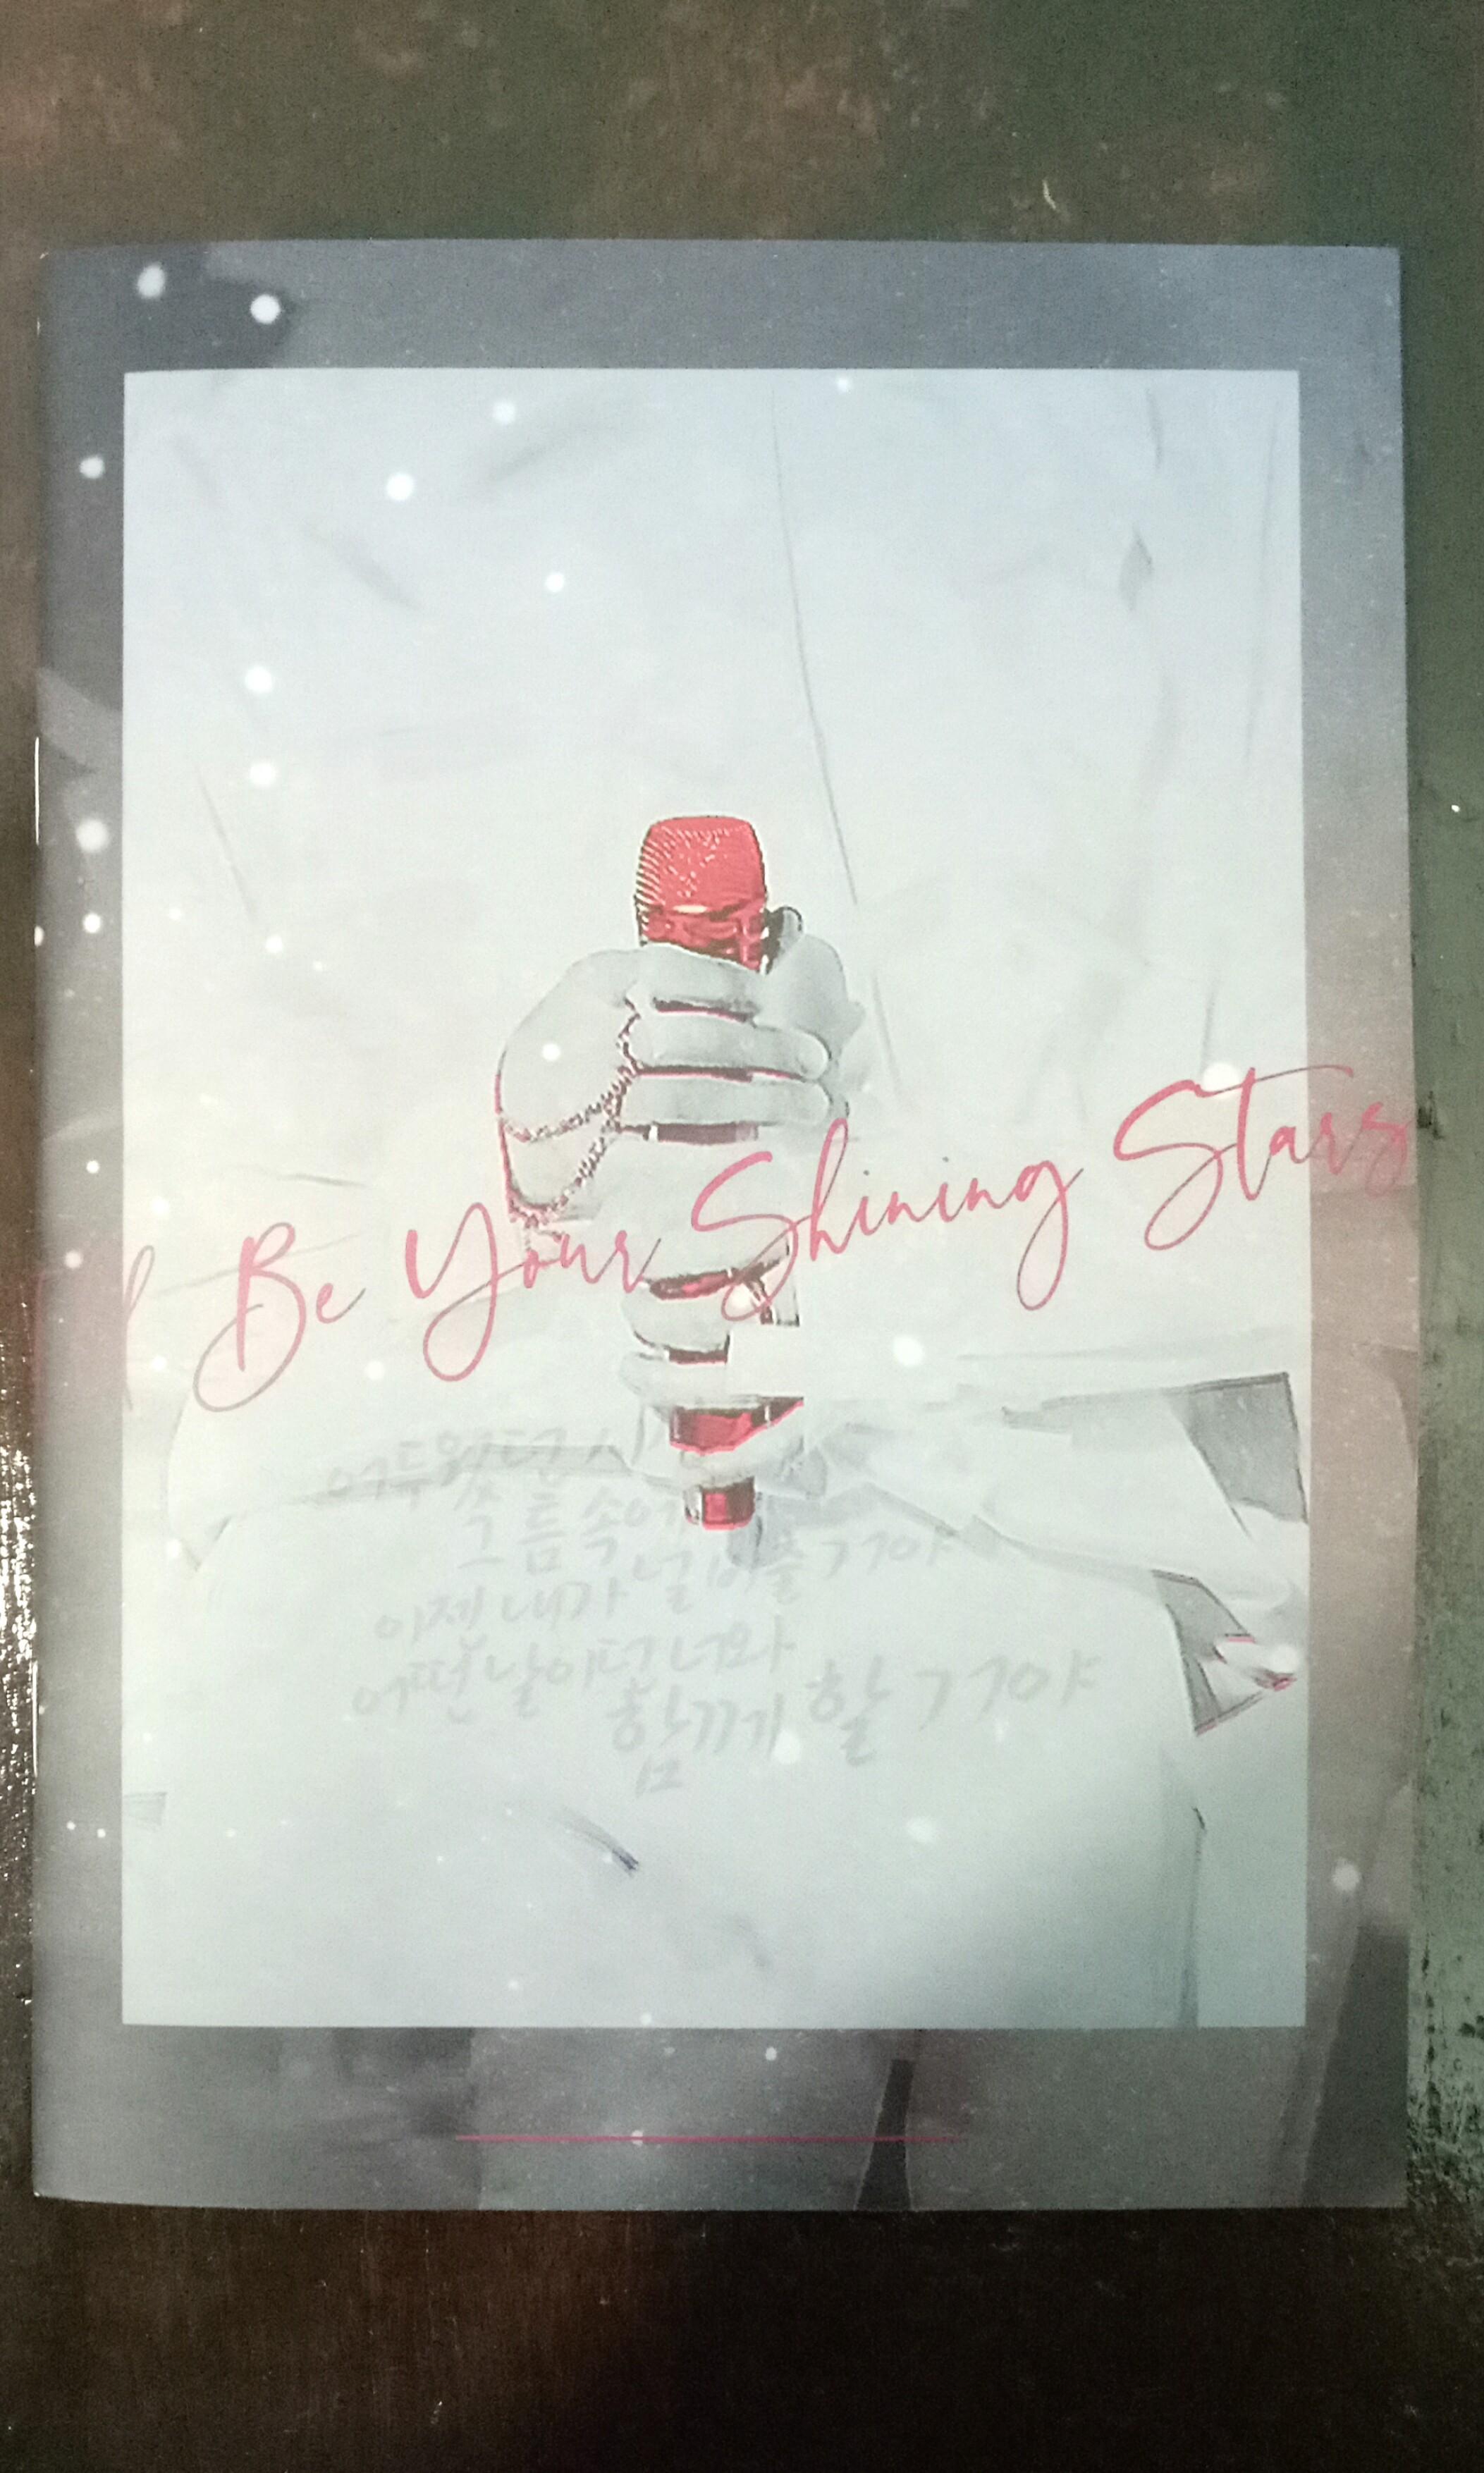 [WTS] AB6IX KIMDONGHYUN FREE MINI PHOTOBOOK by @/pinkgalaxy0917